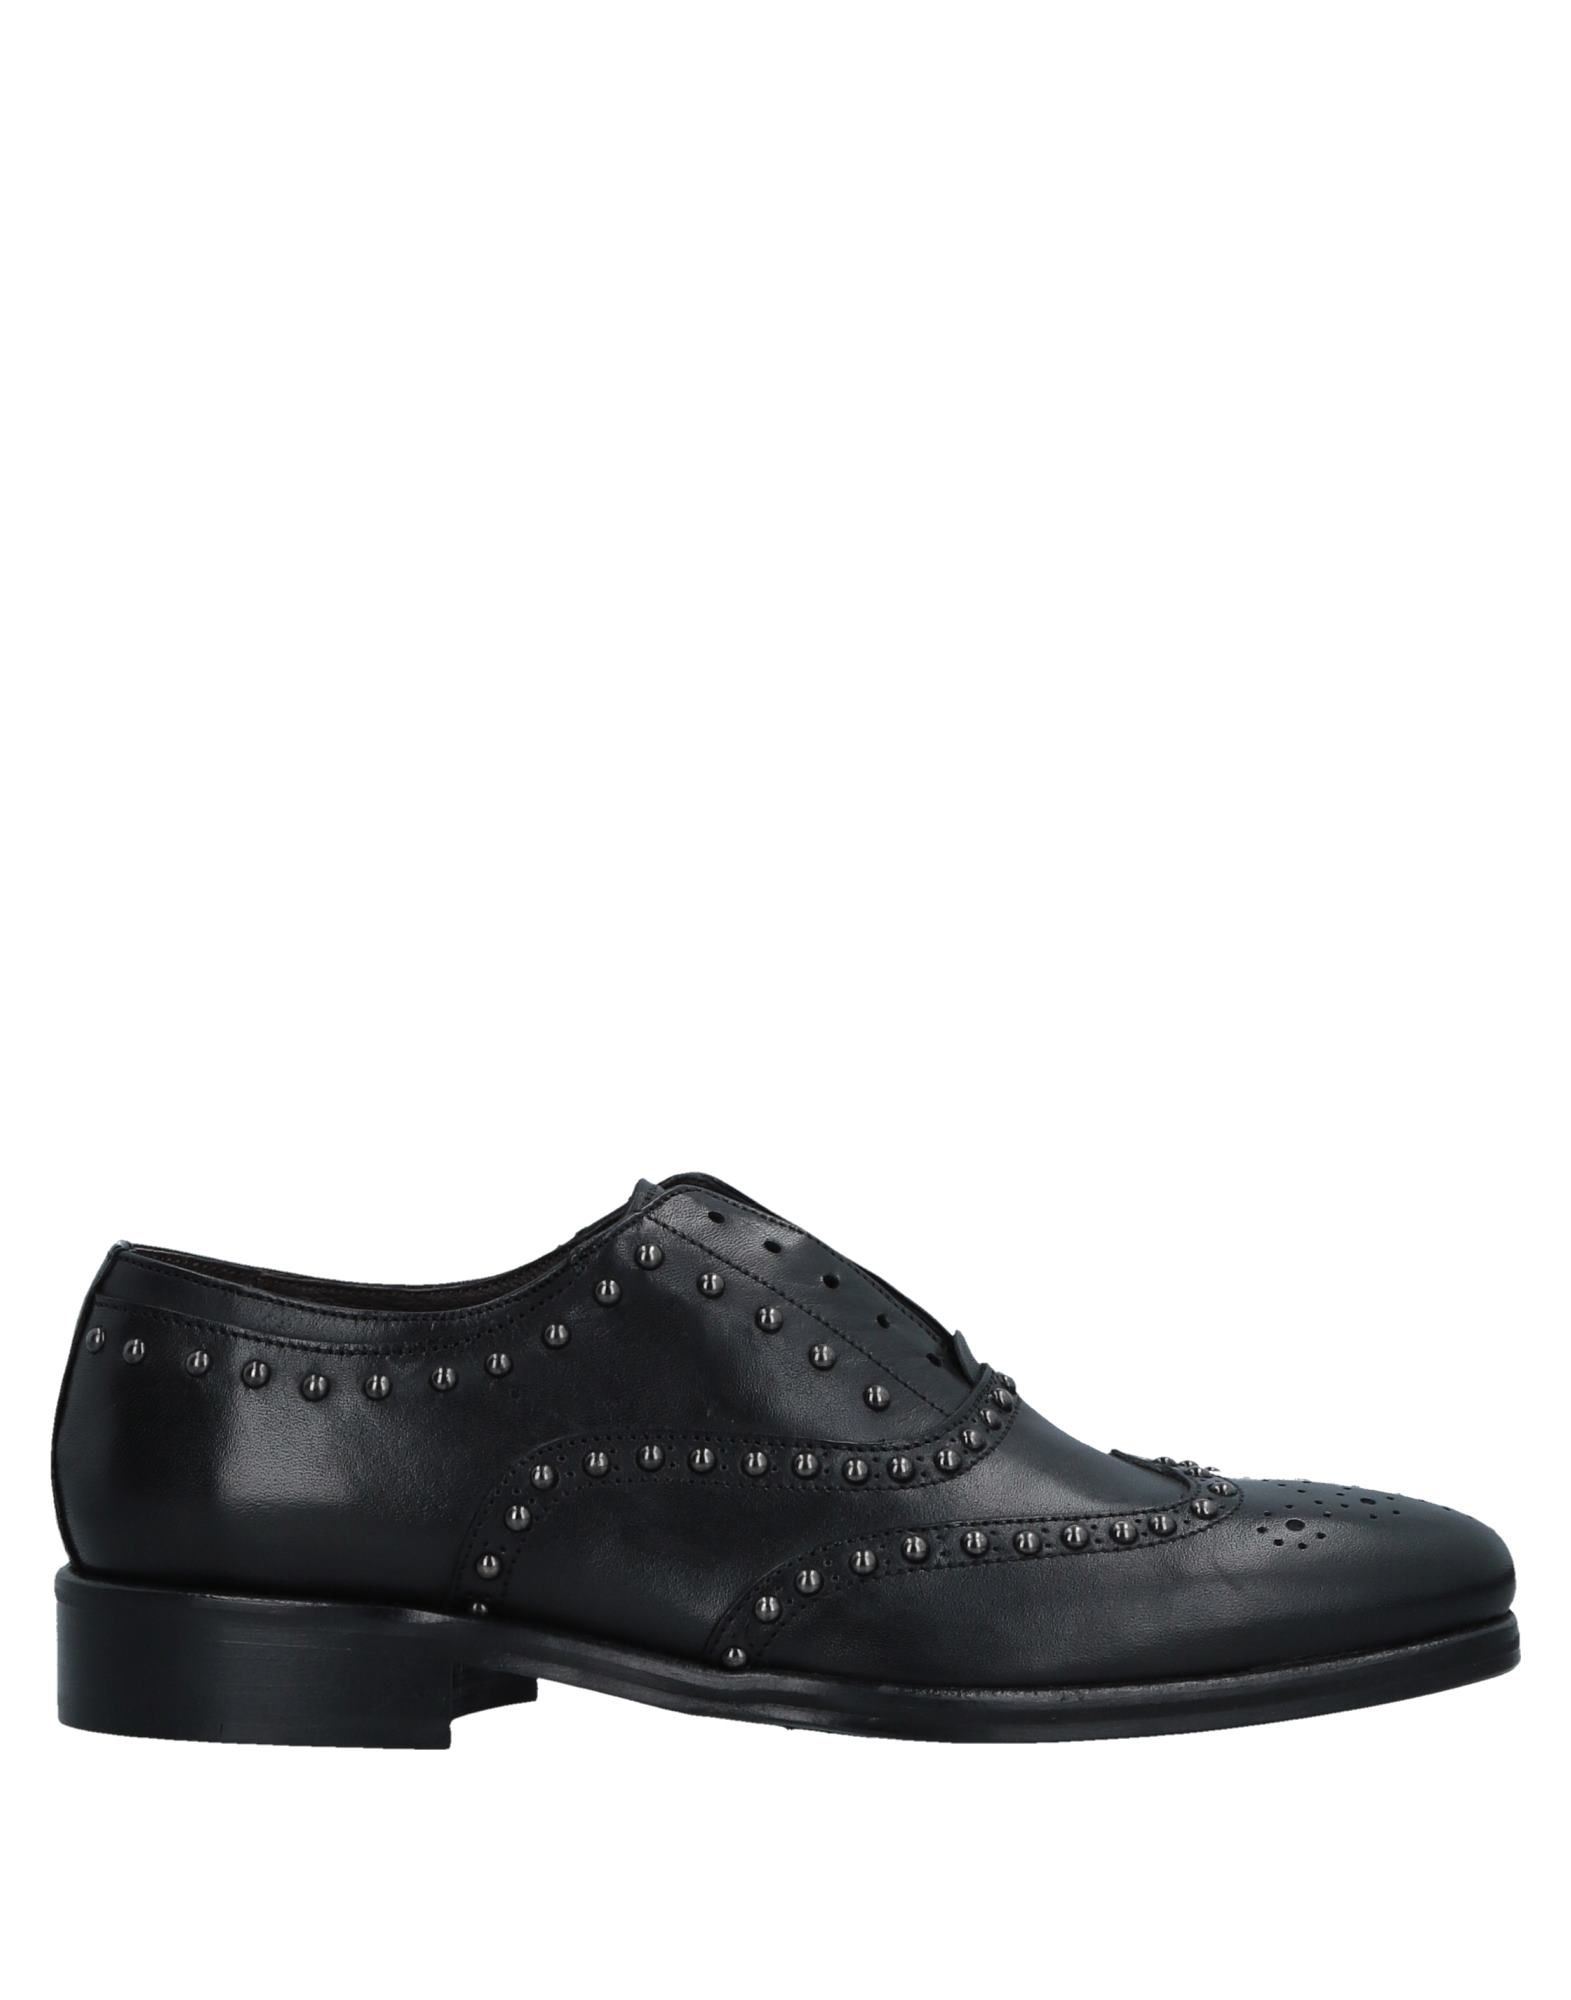 Daniele Alessandrini Mokassins Herren  11521219TW Gute Qualität beliebte Schuhe